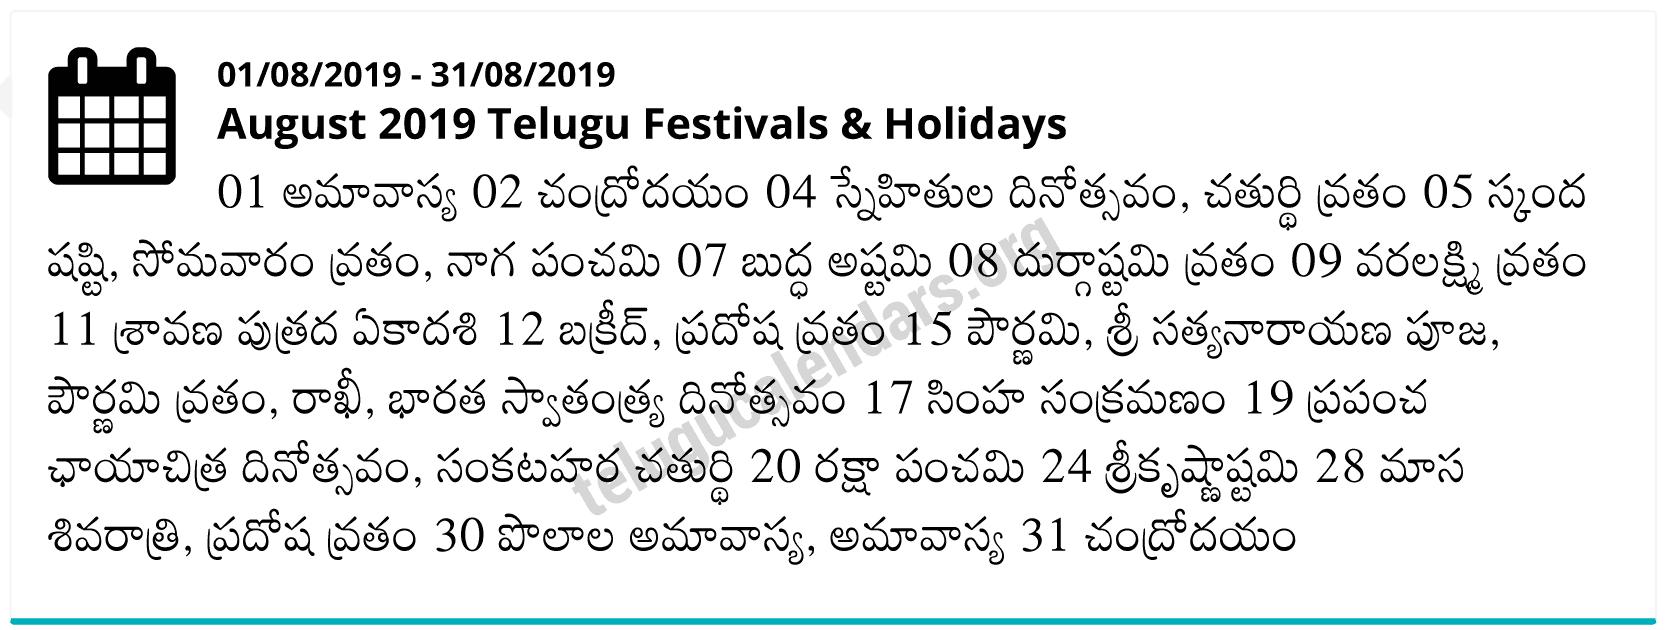 festivals in august 2019